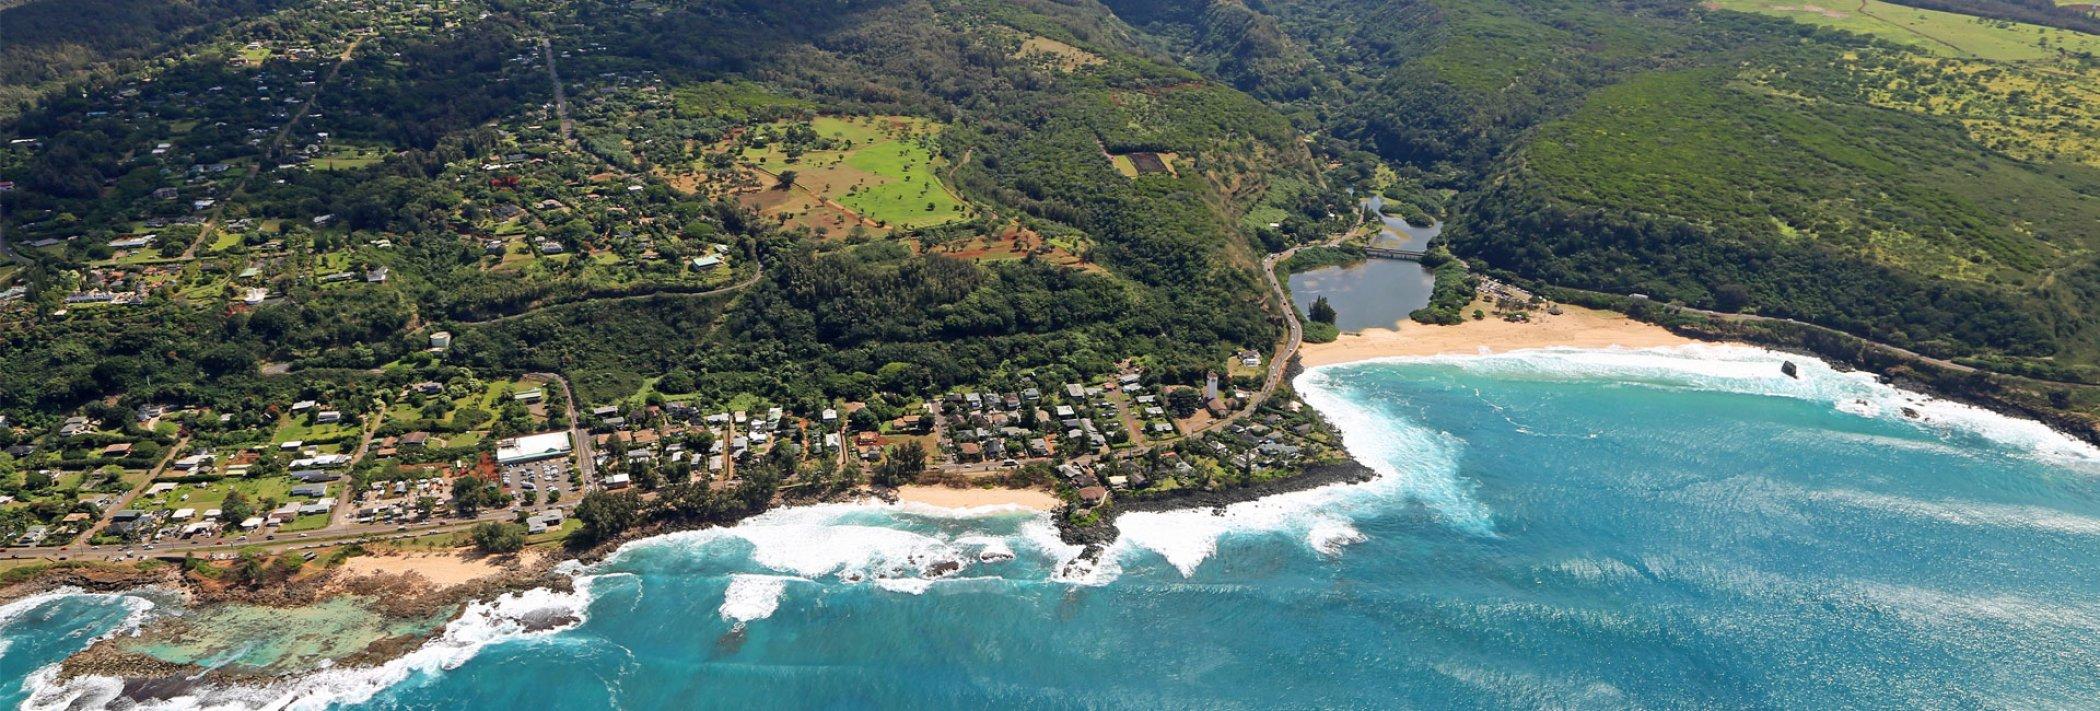 Hawaii Travel Guide Book Reviews